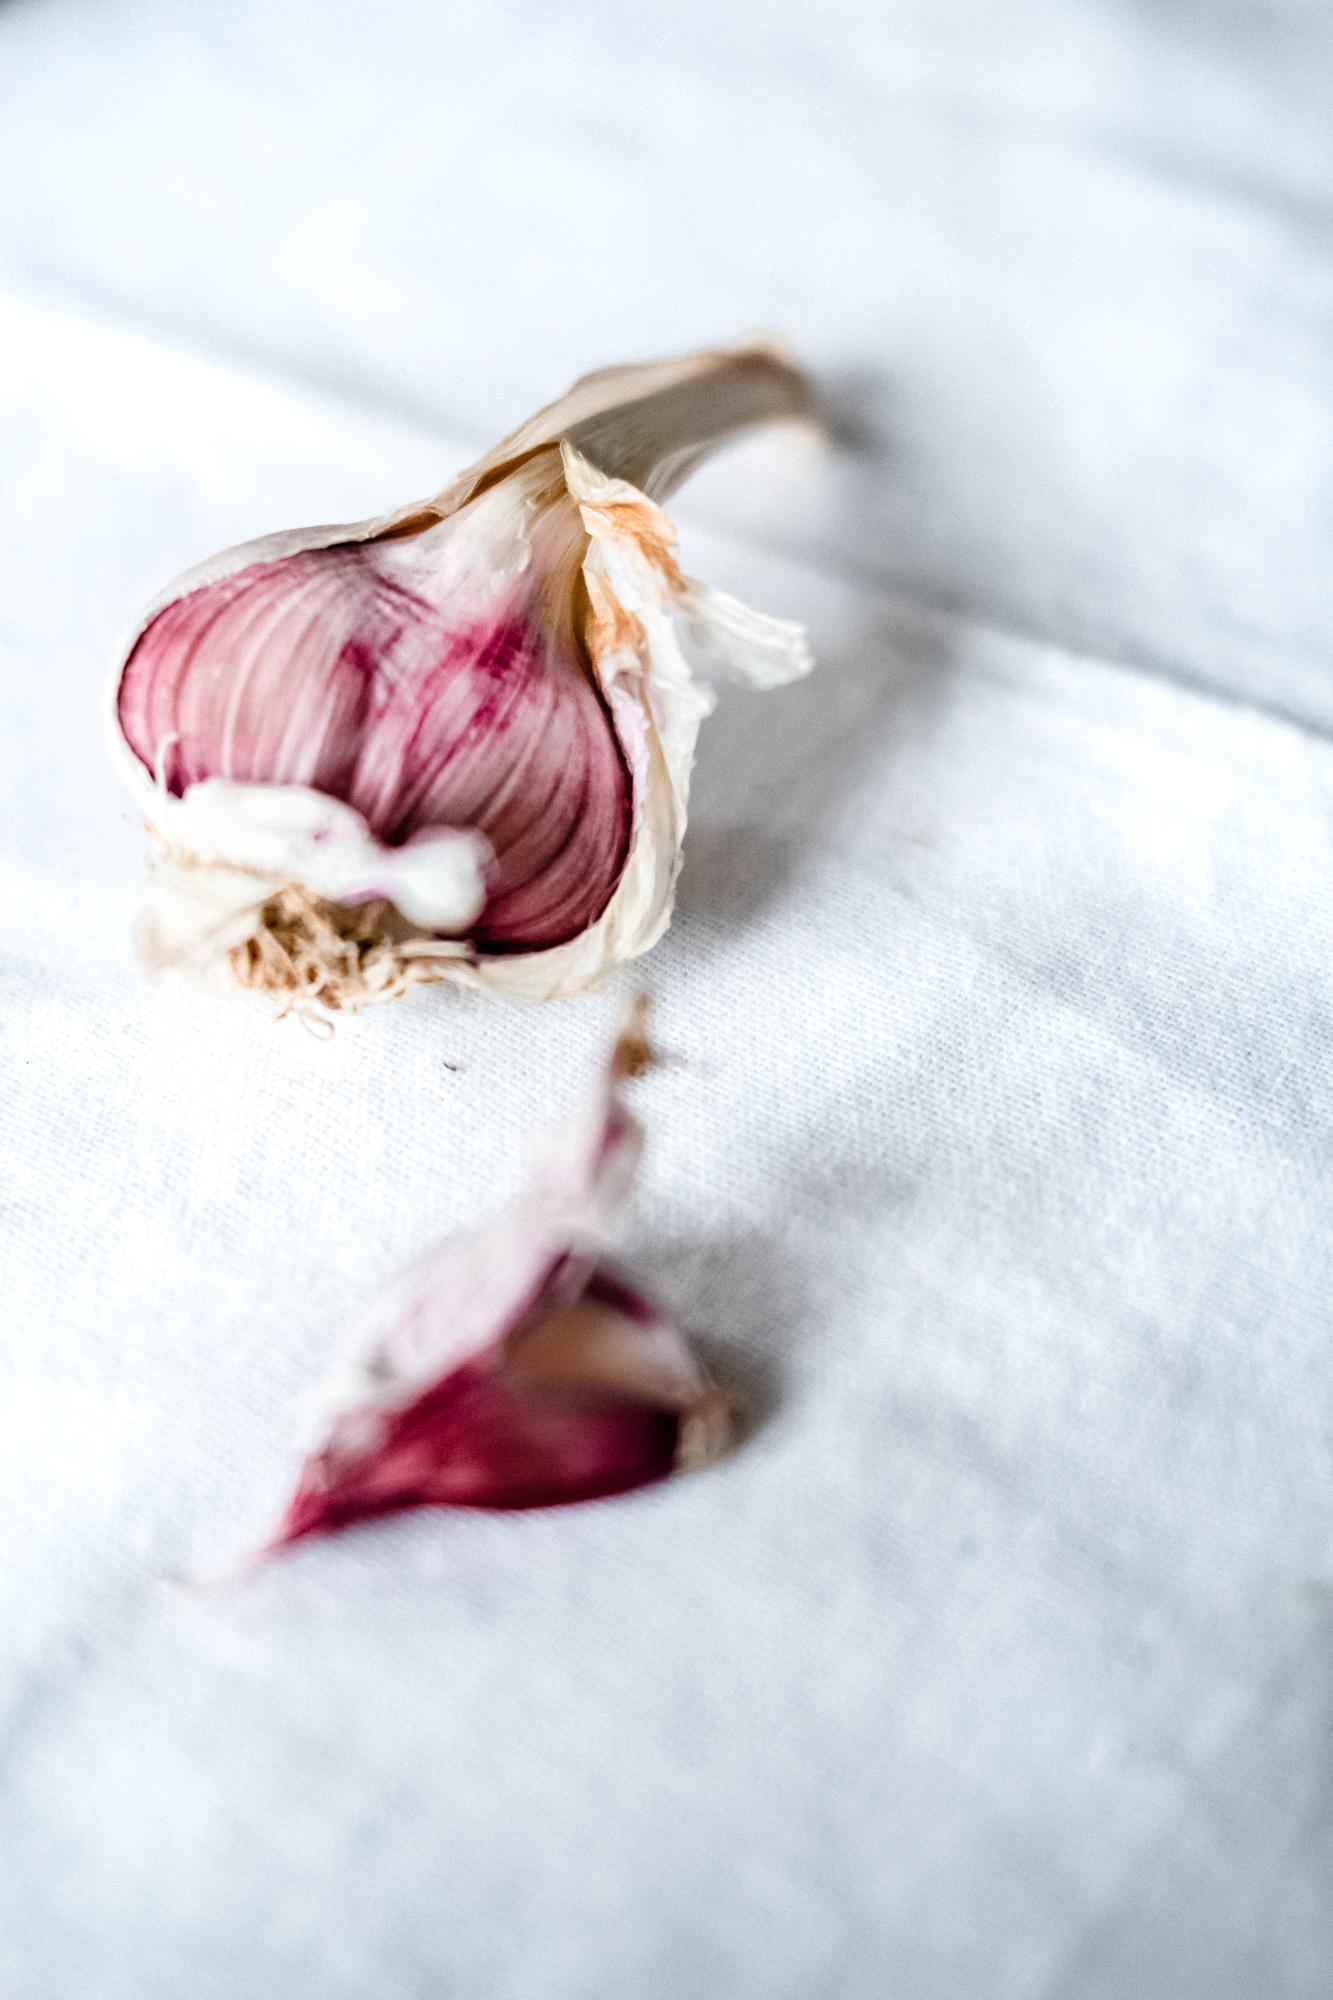 Foodfotografie mit dem SIGMA 45mm F2,8 DG DN | Contemporary © Katharina Traub